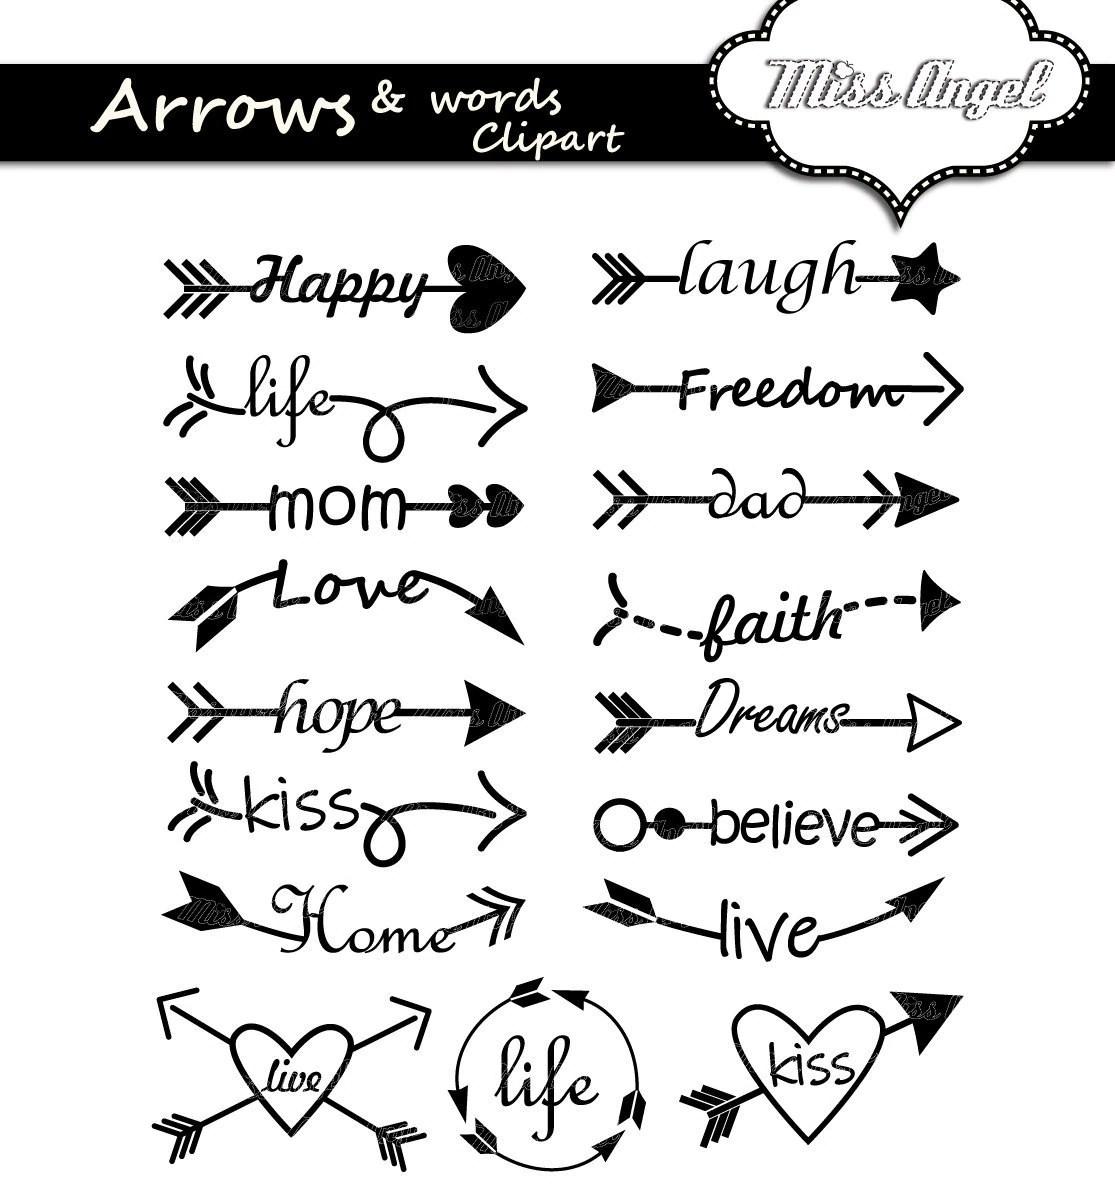 Arrows Words Clipart Arrow Words Clip Art 17 Digital